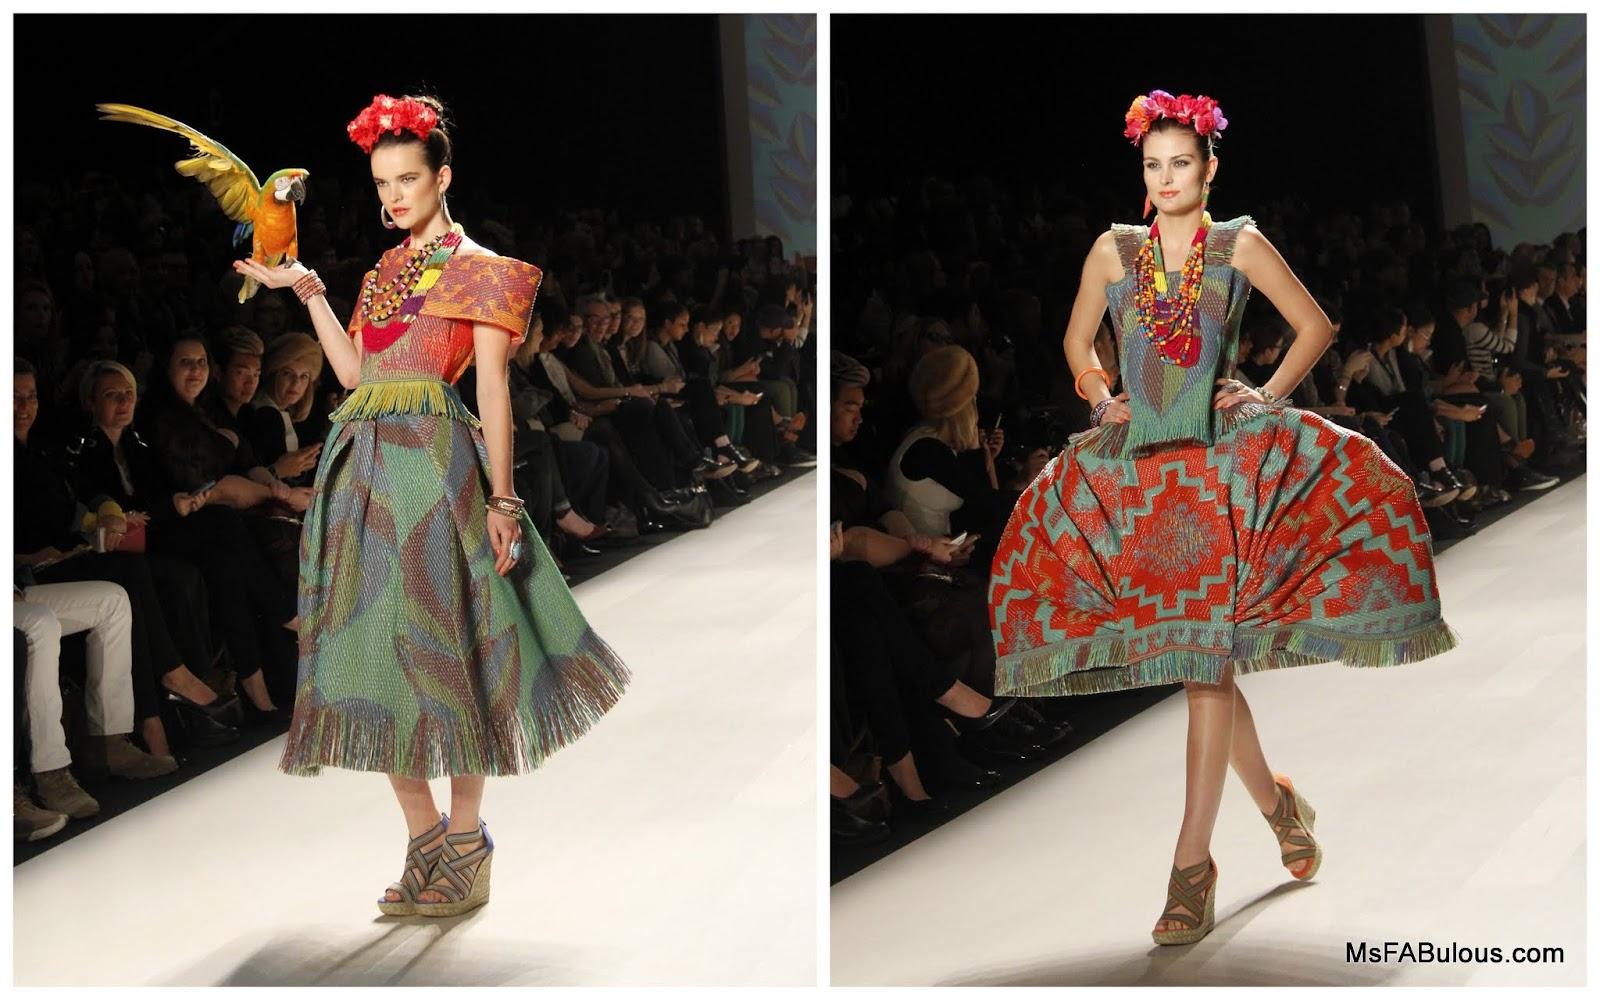 ms fabulous toronto fashion week korhani home spring 2013 fashion design indie clothing. Black Bedroom Furniture Sets. Home Design Ideas